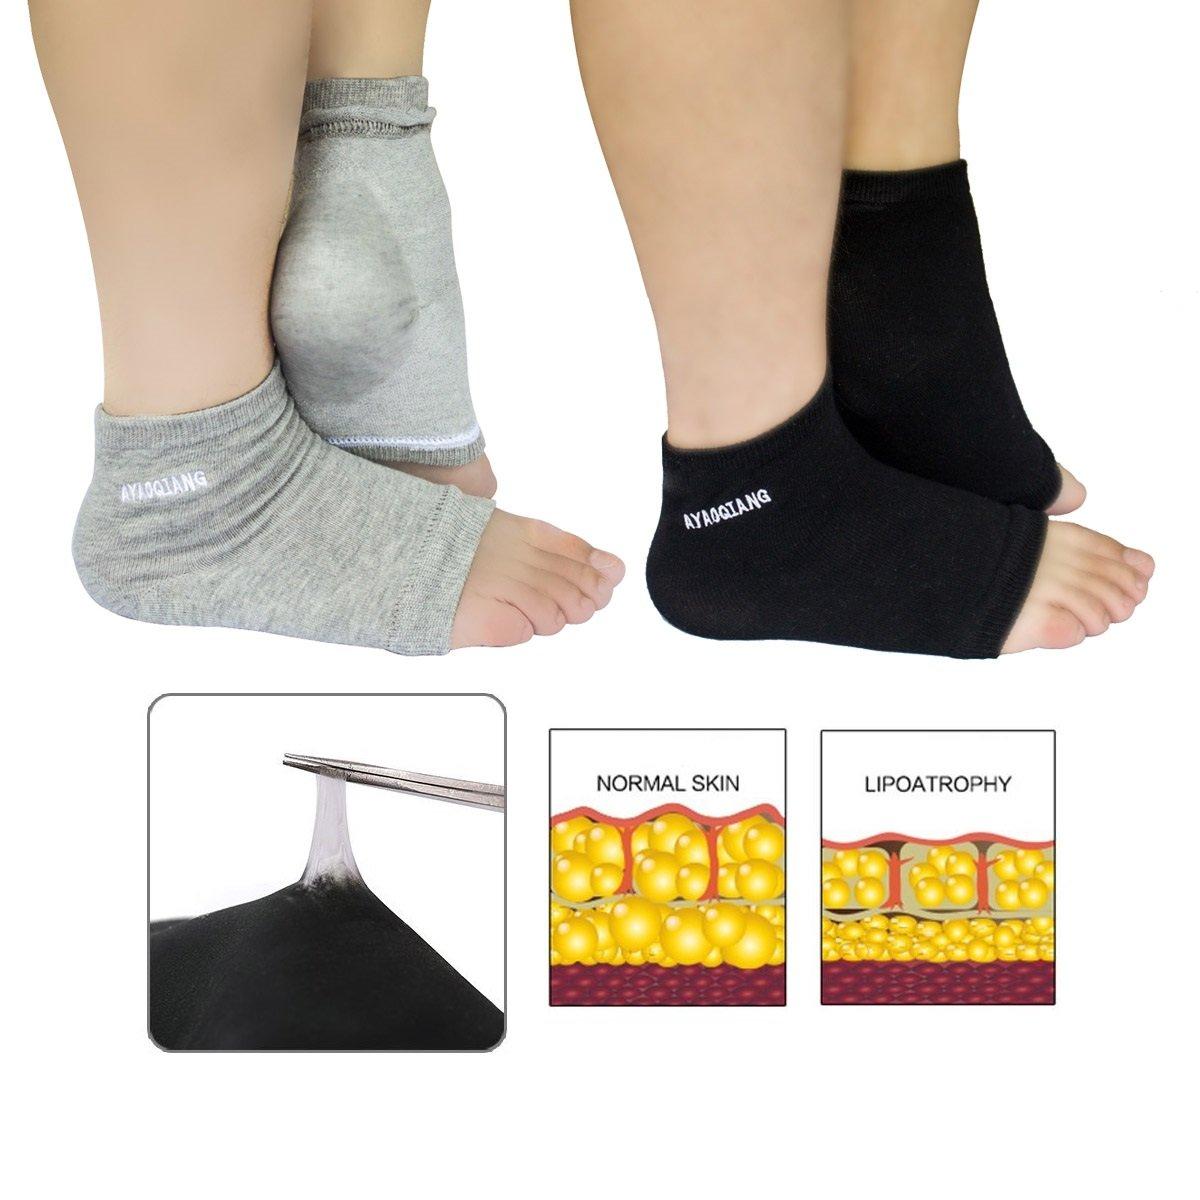 AYAOQIANG Gel Heel Socks Open Toe Socks for Dry Hard Cracked Skin Moisturizing Day Night Care Skin,Gel to Heal Dry Cracked Heels -2 Pair(Black and Grey)